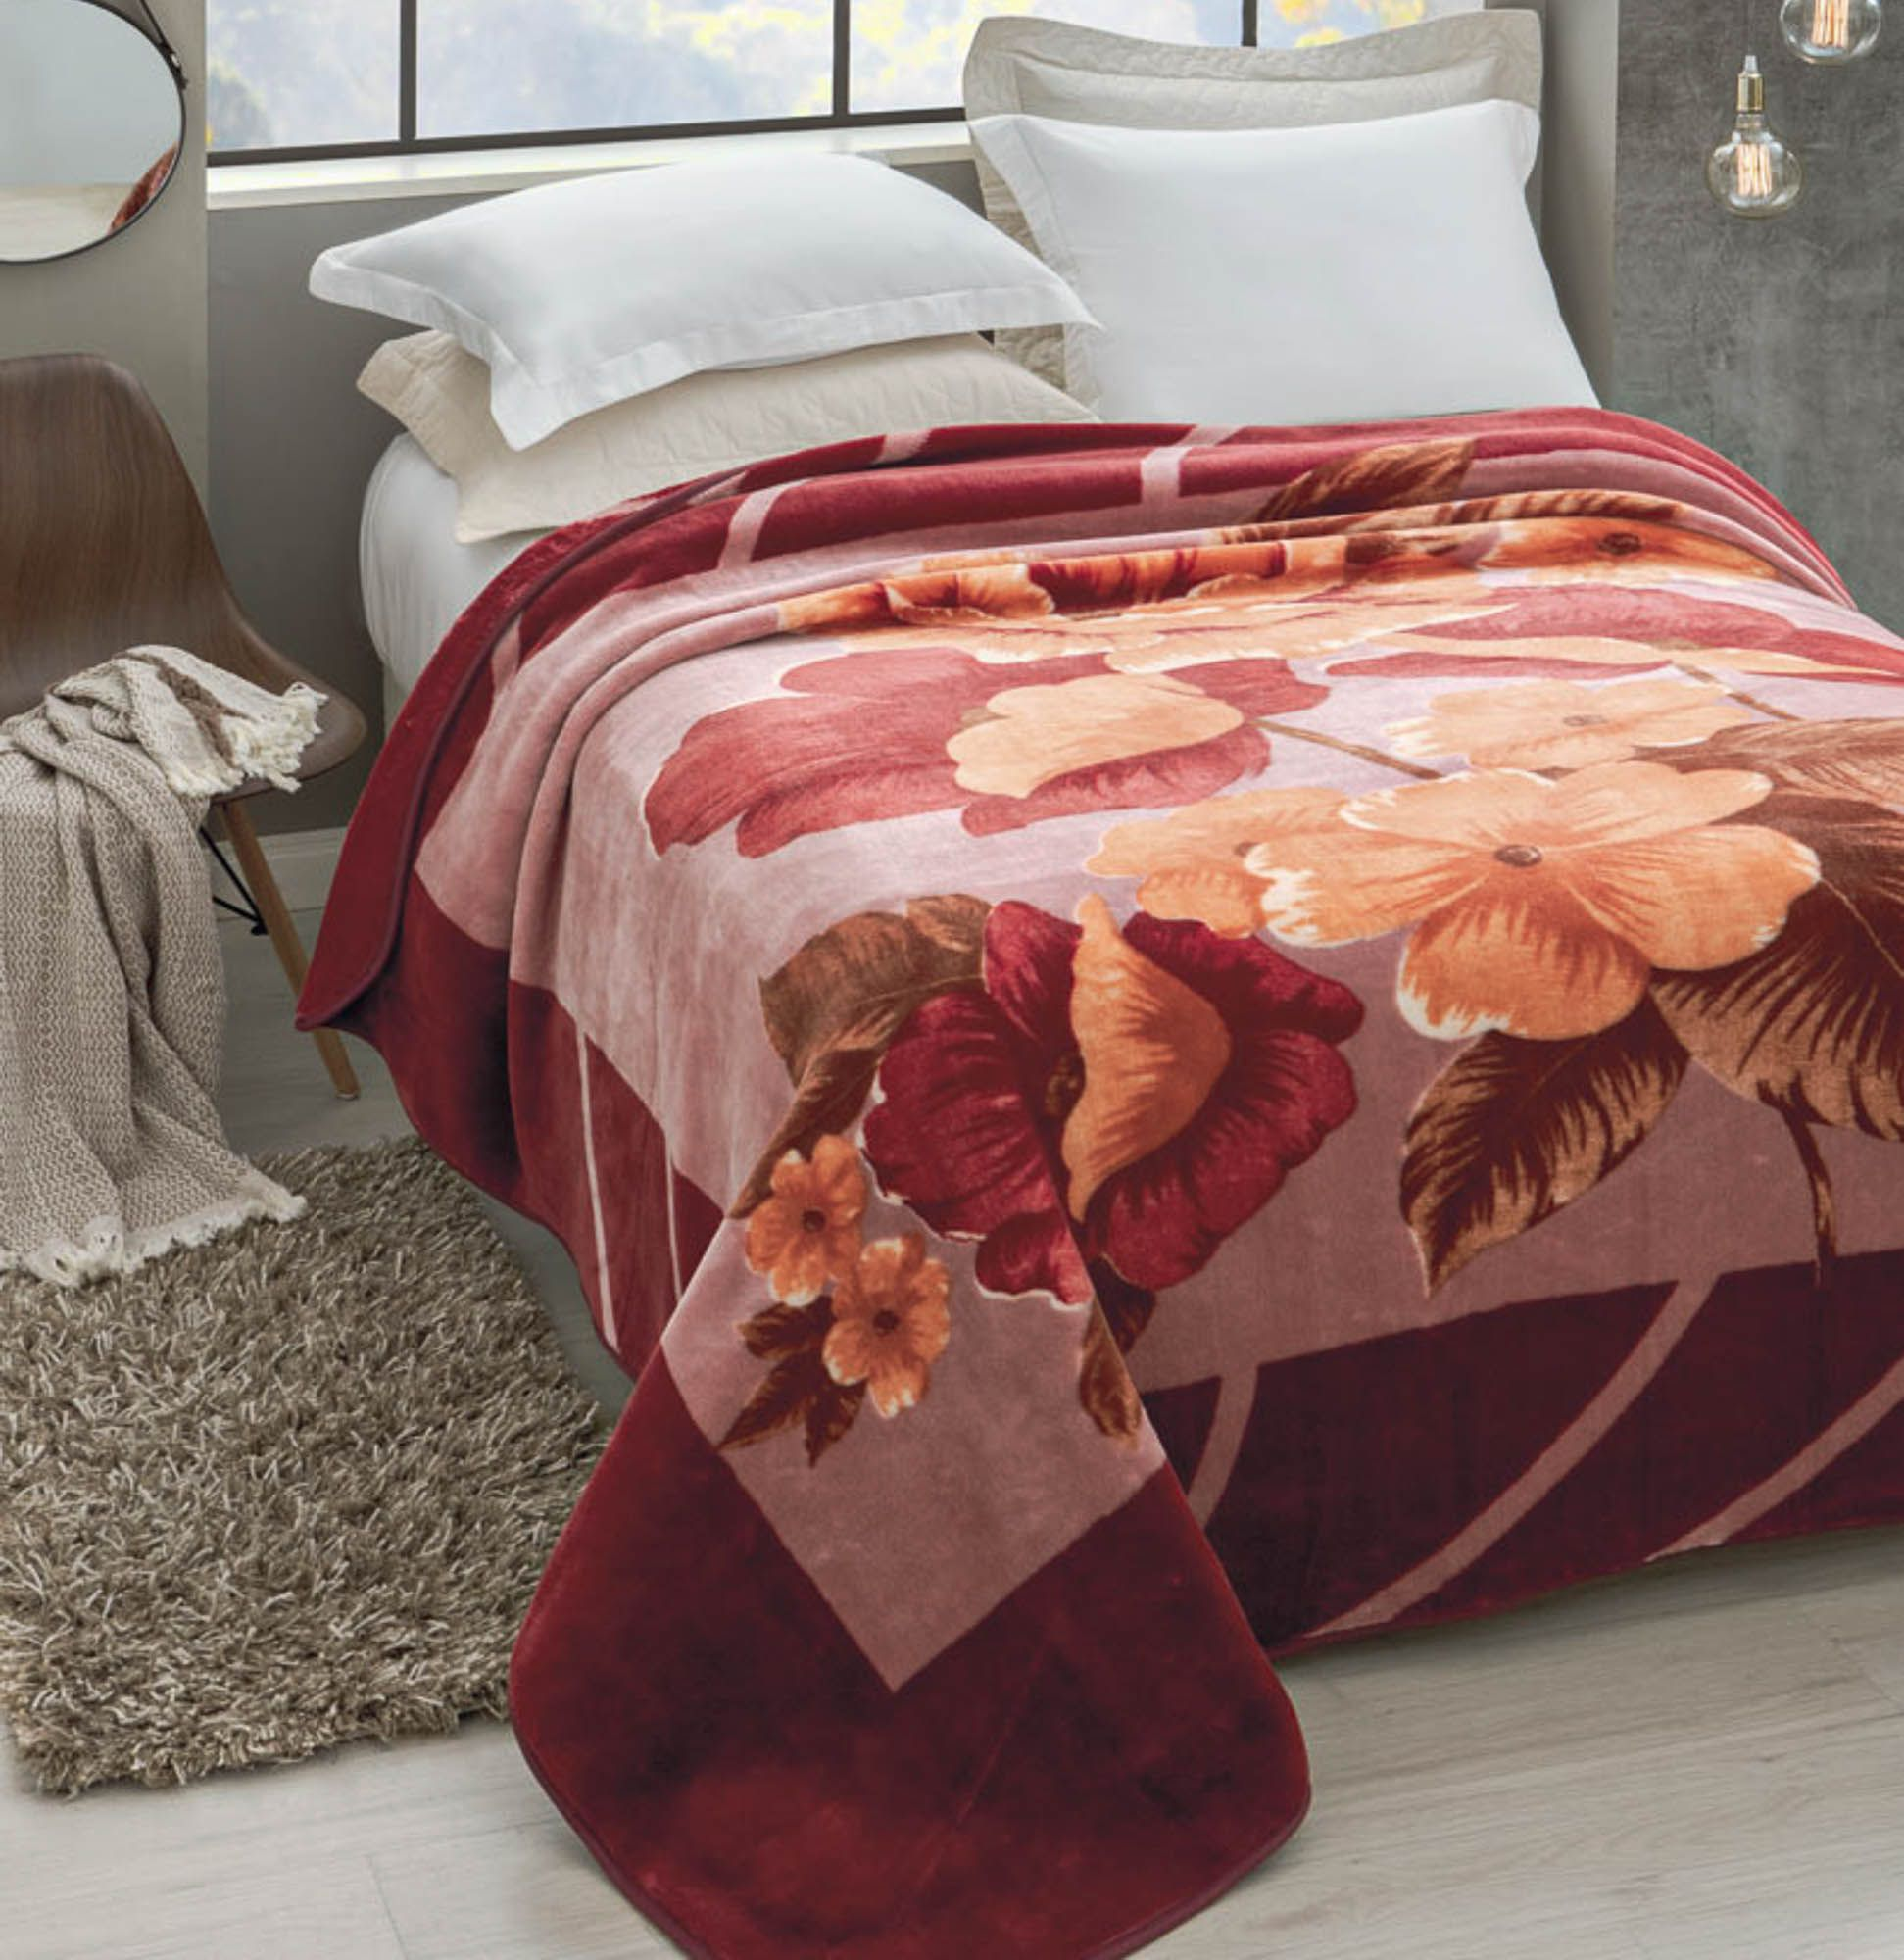 Cobertor Jolitex Raschel Casal 1,80x2,20m Esperance